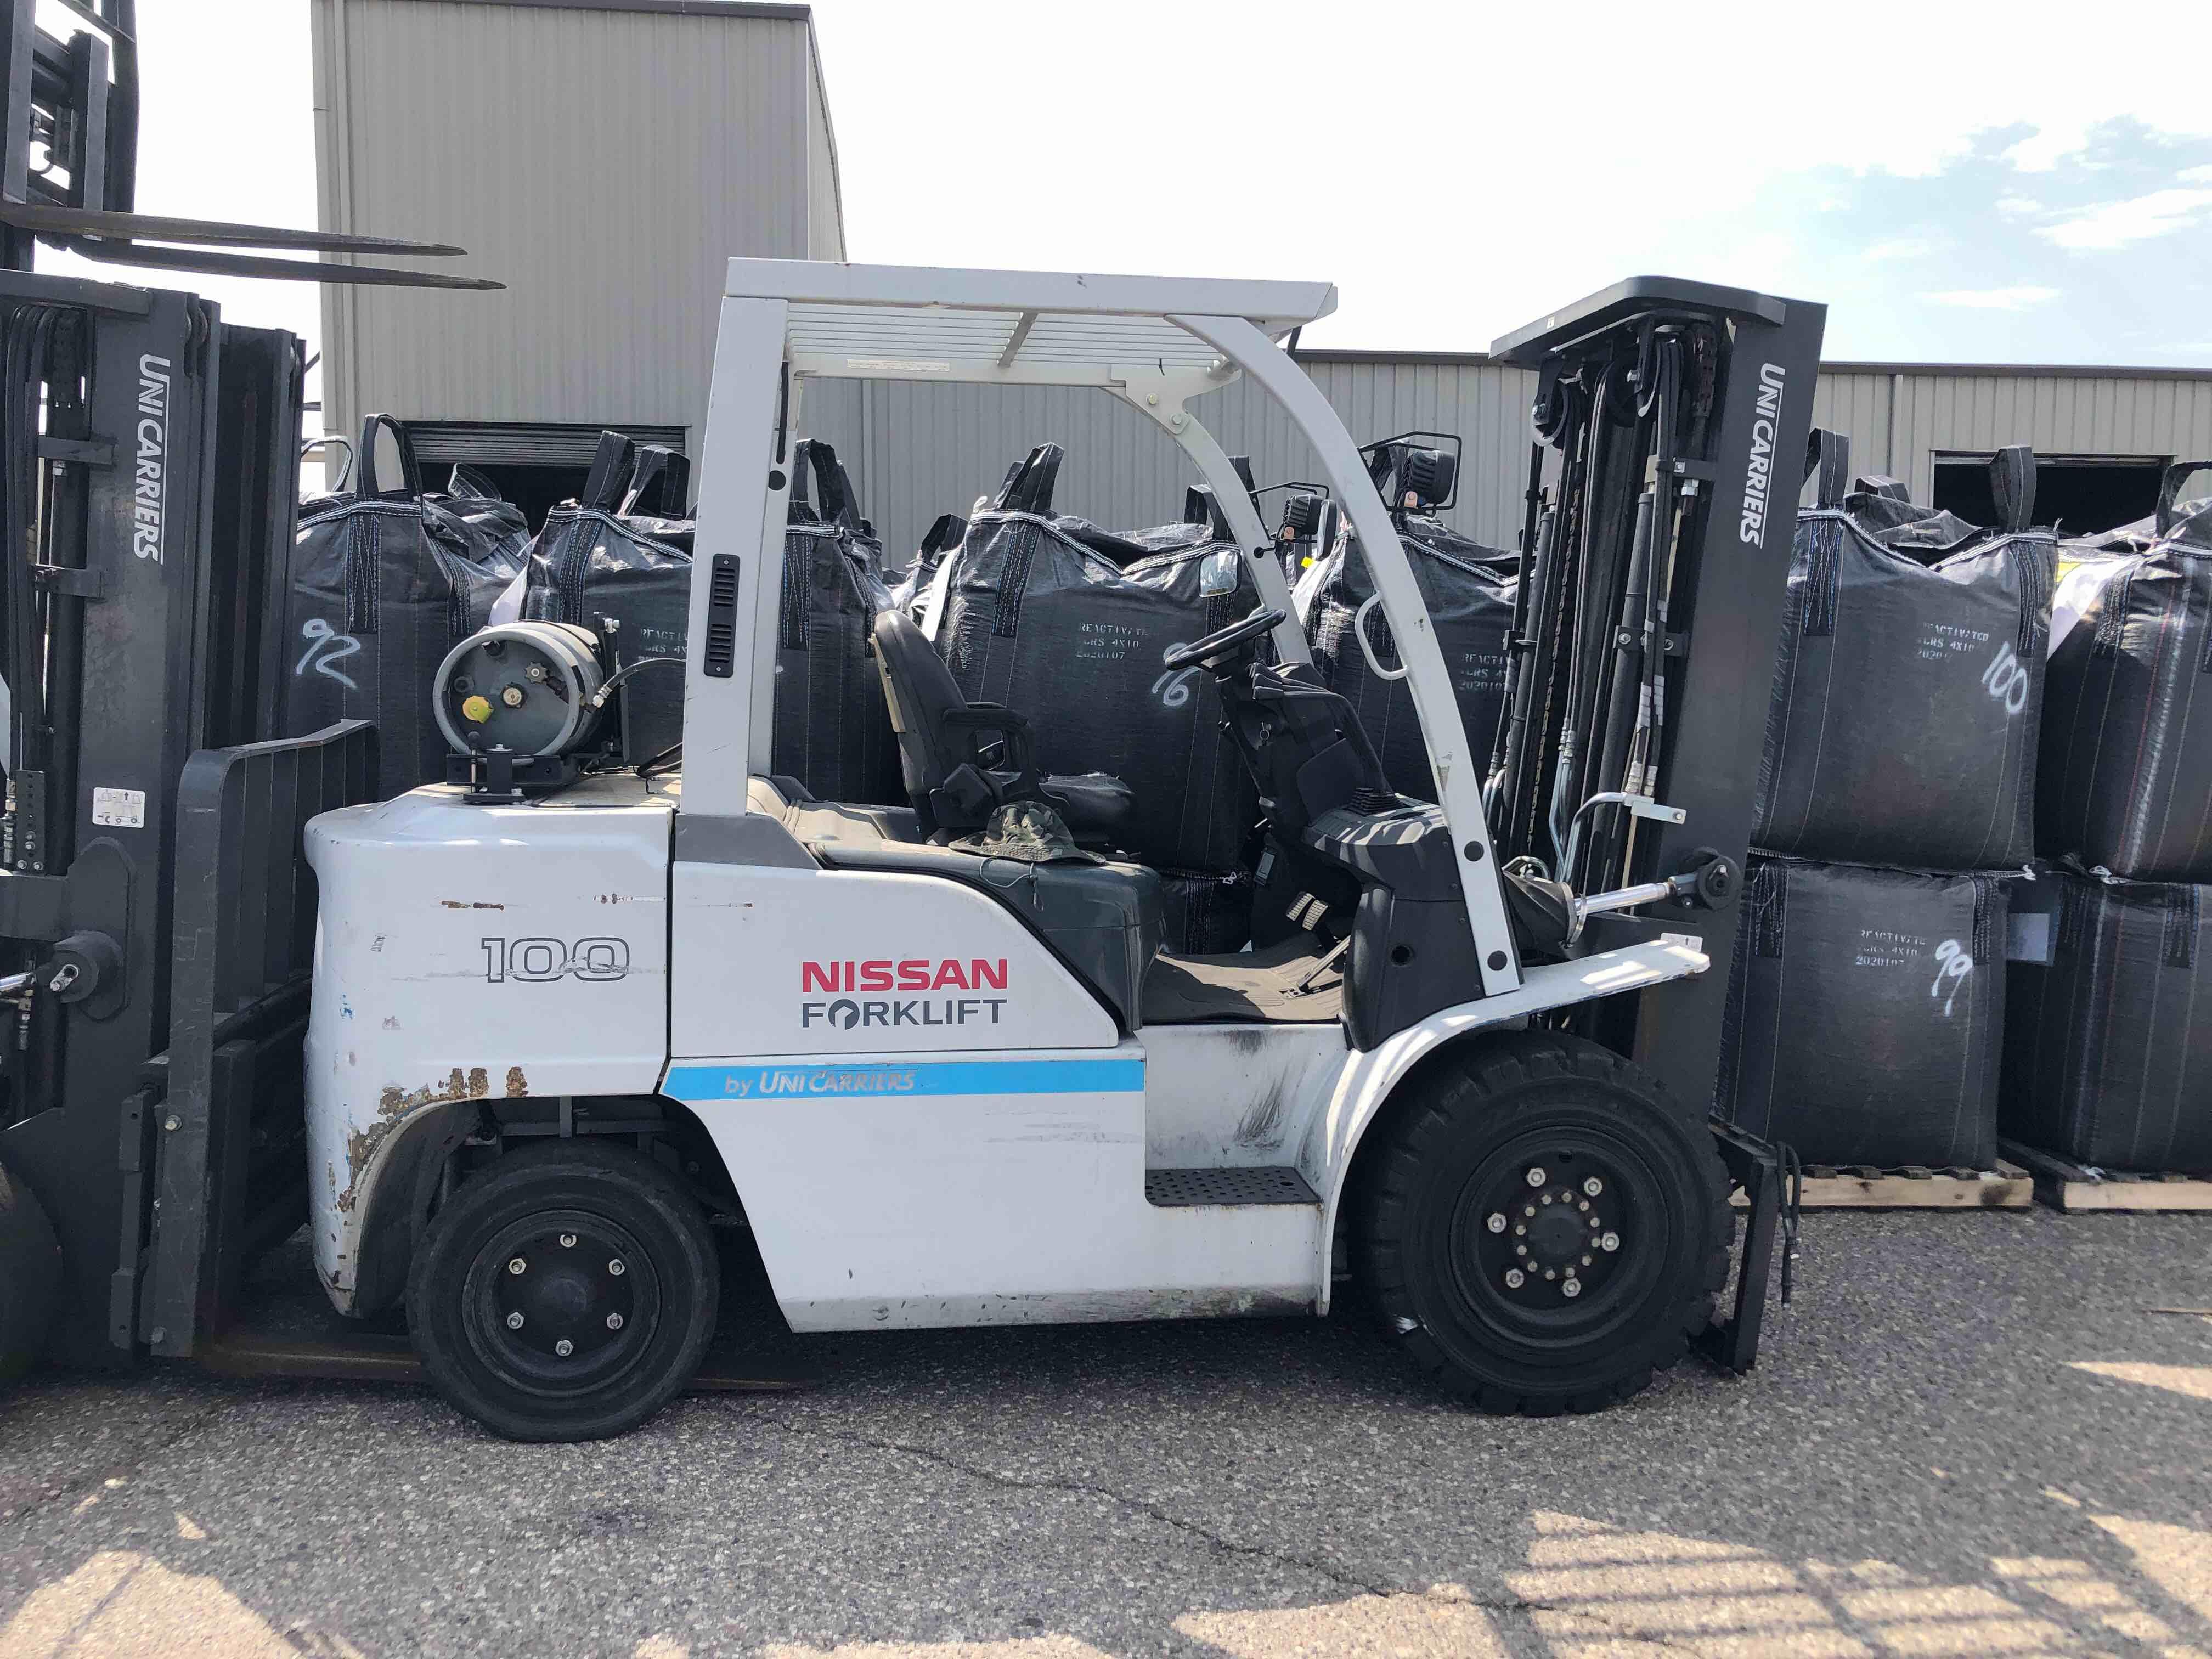 PF100YLP J1F4-980947